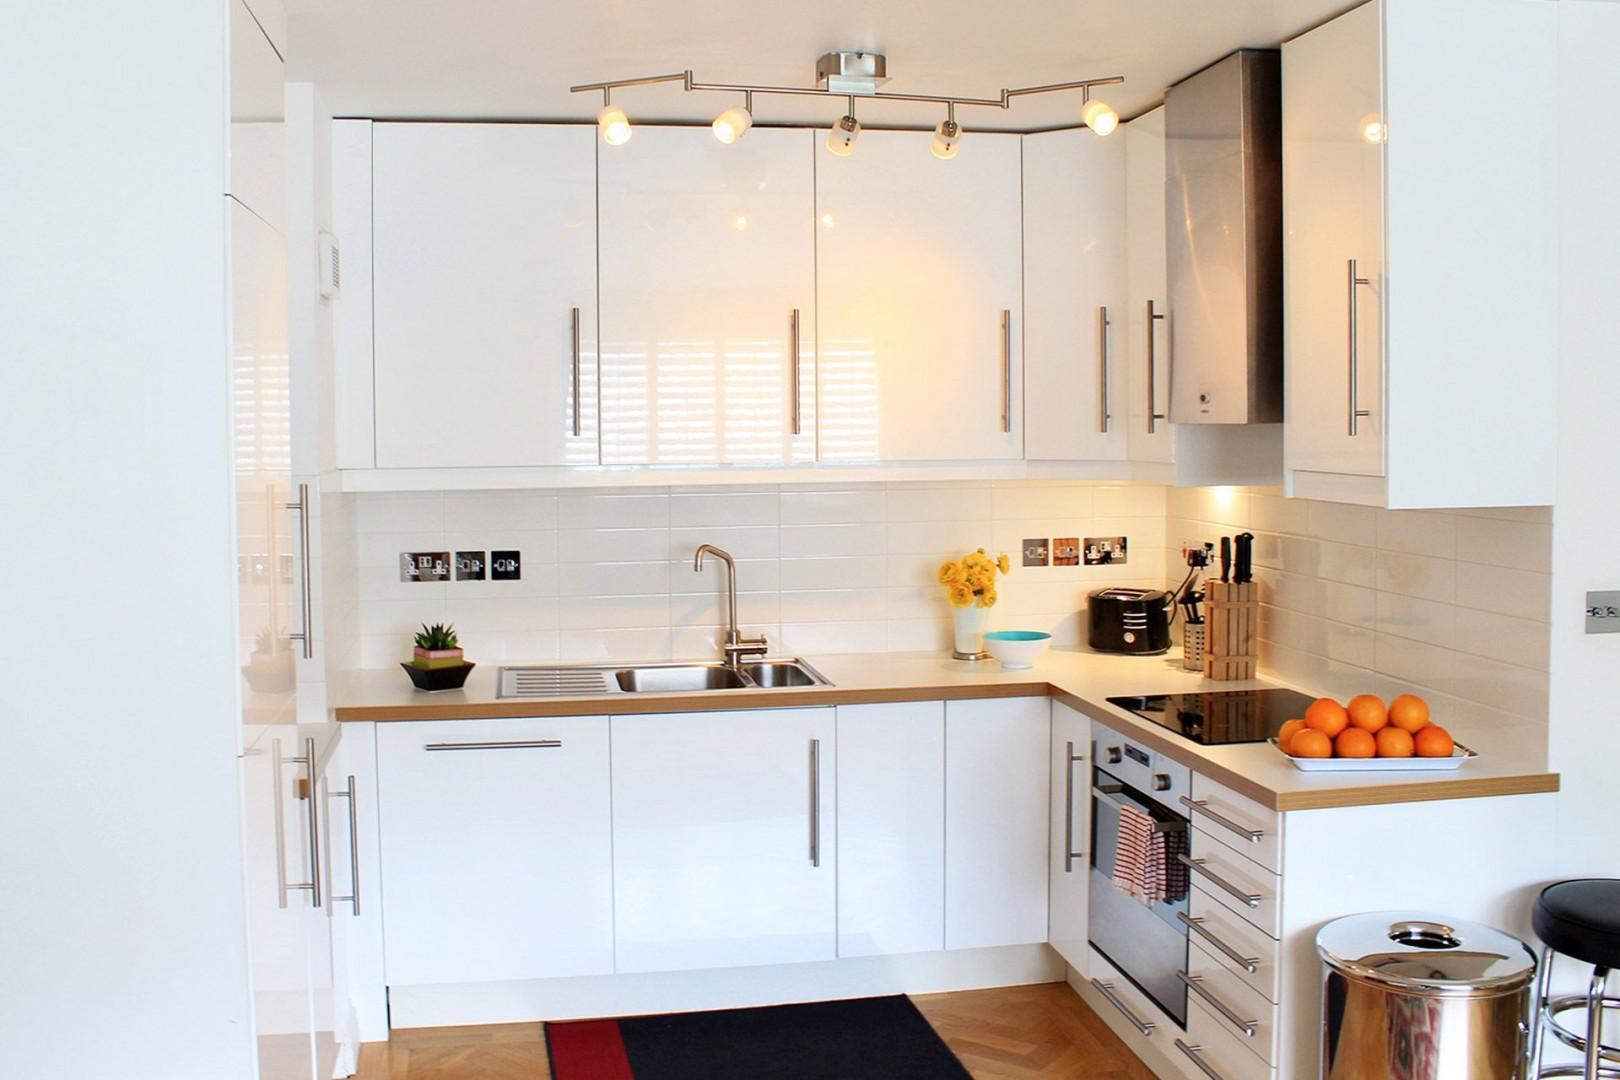 Stylish white kitchen with modern appliances